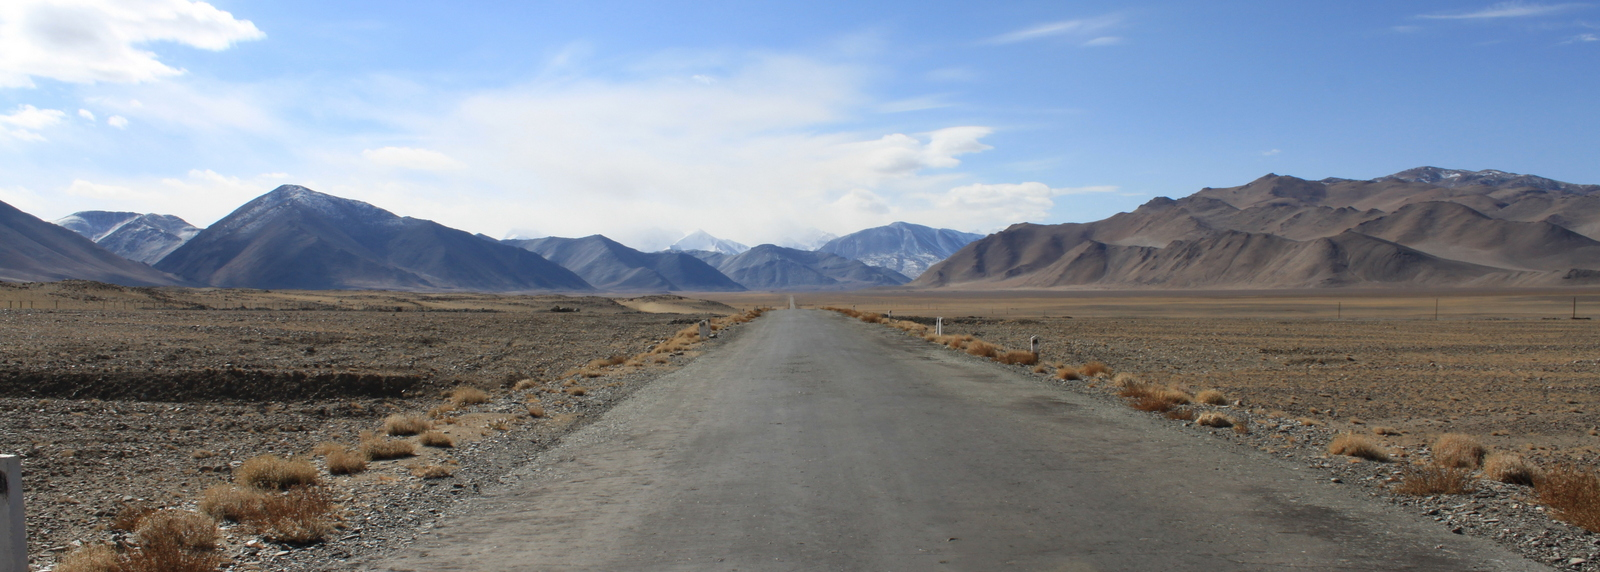 Pamir Highway, Tadzjikistan